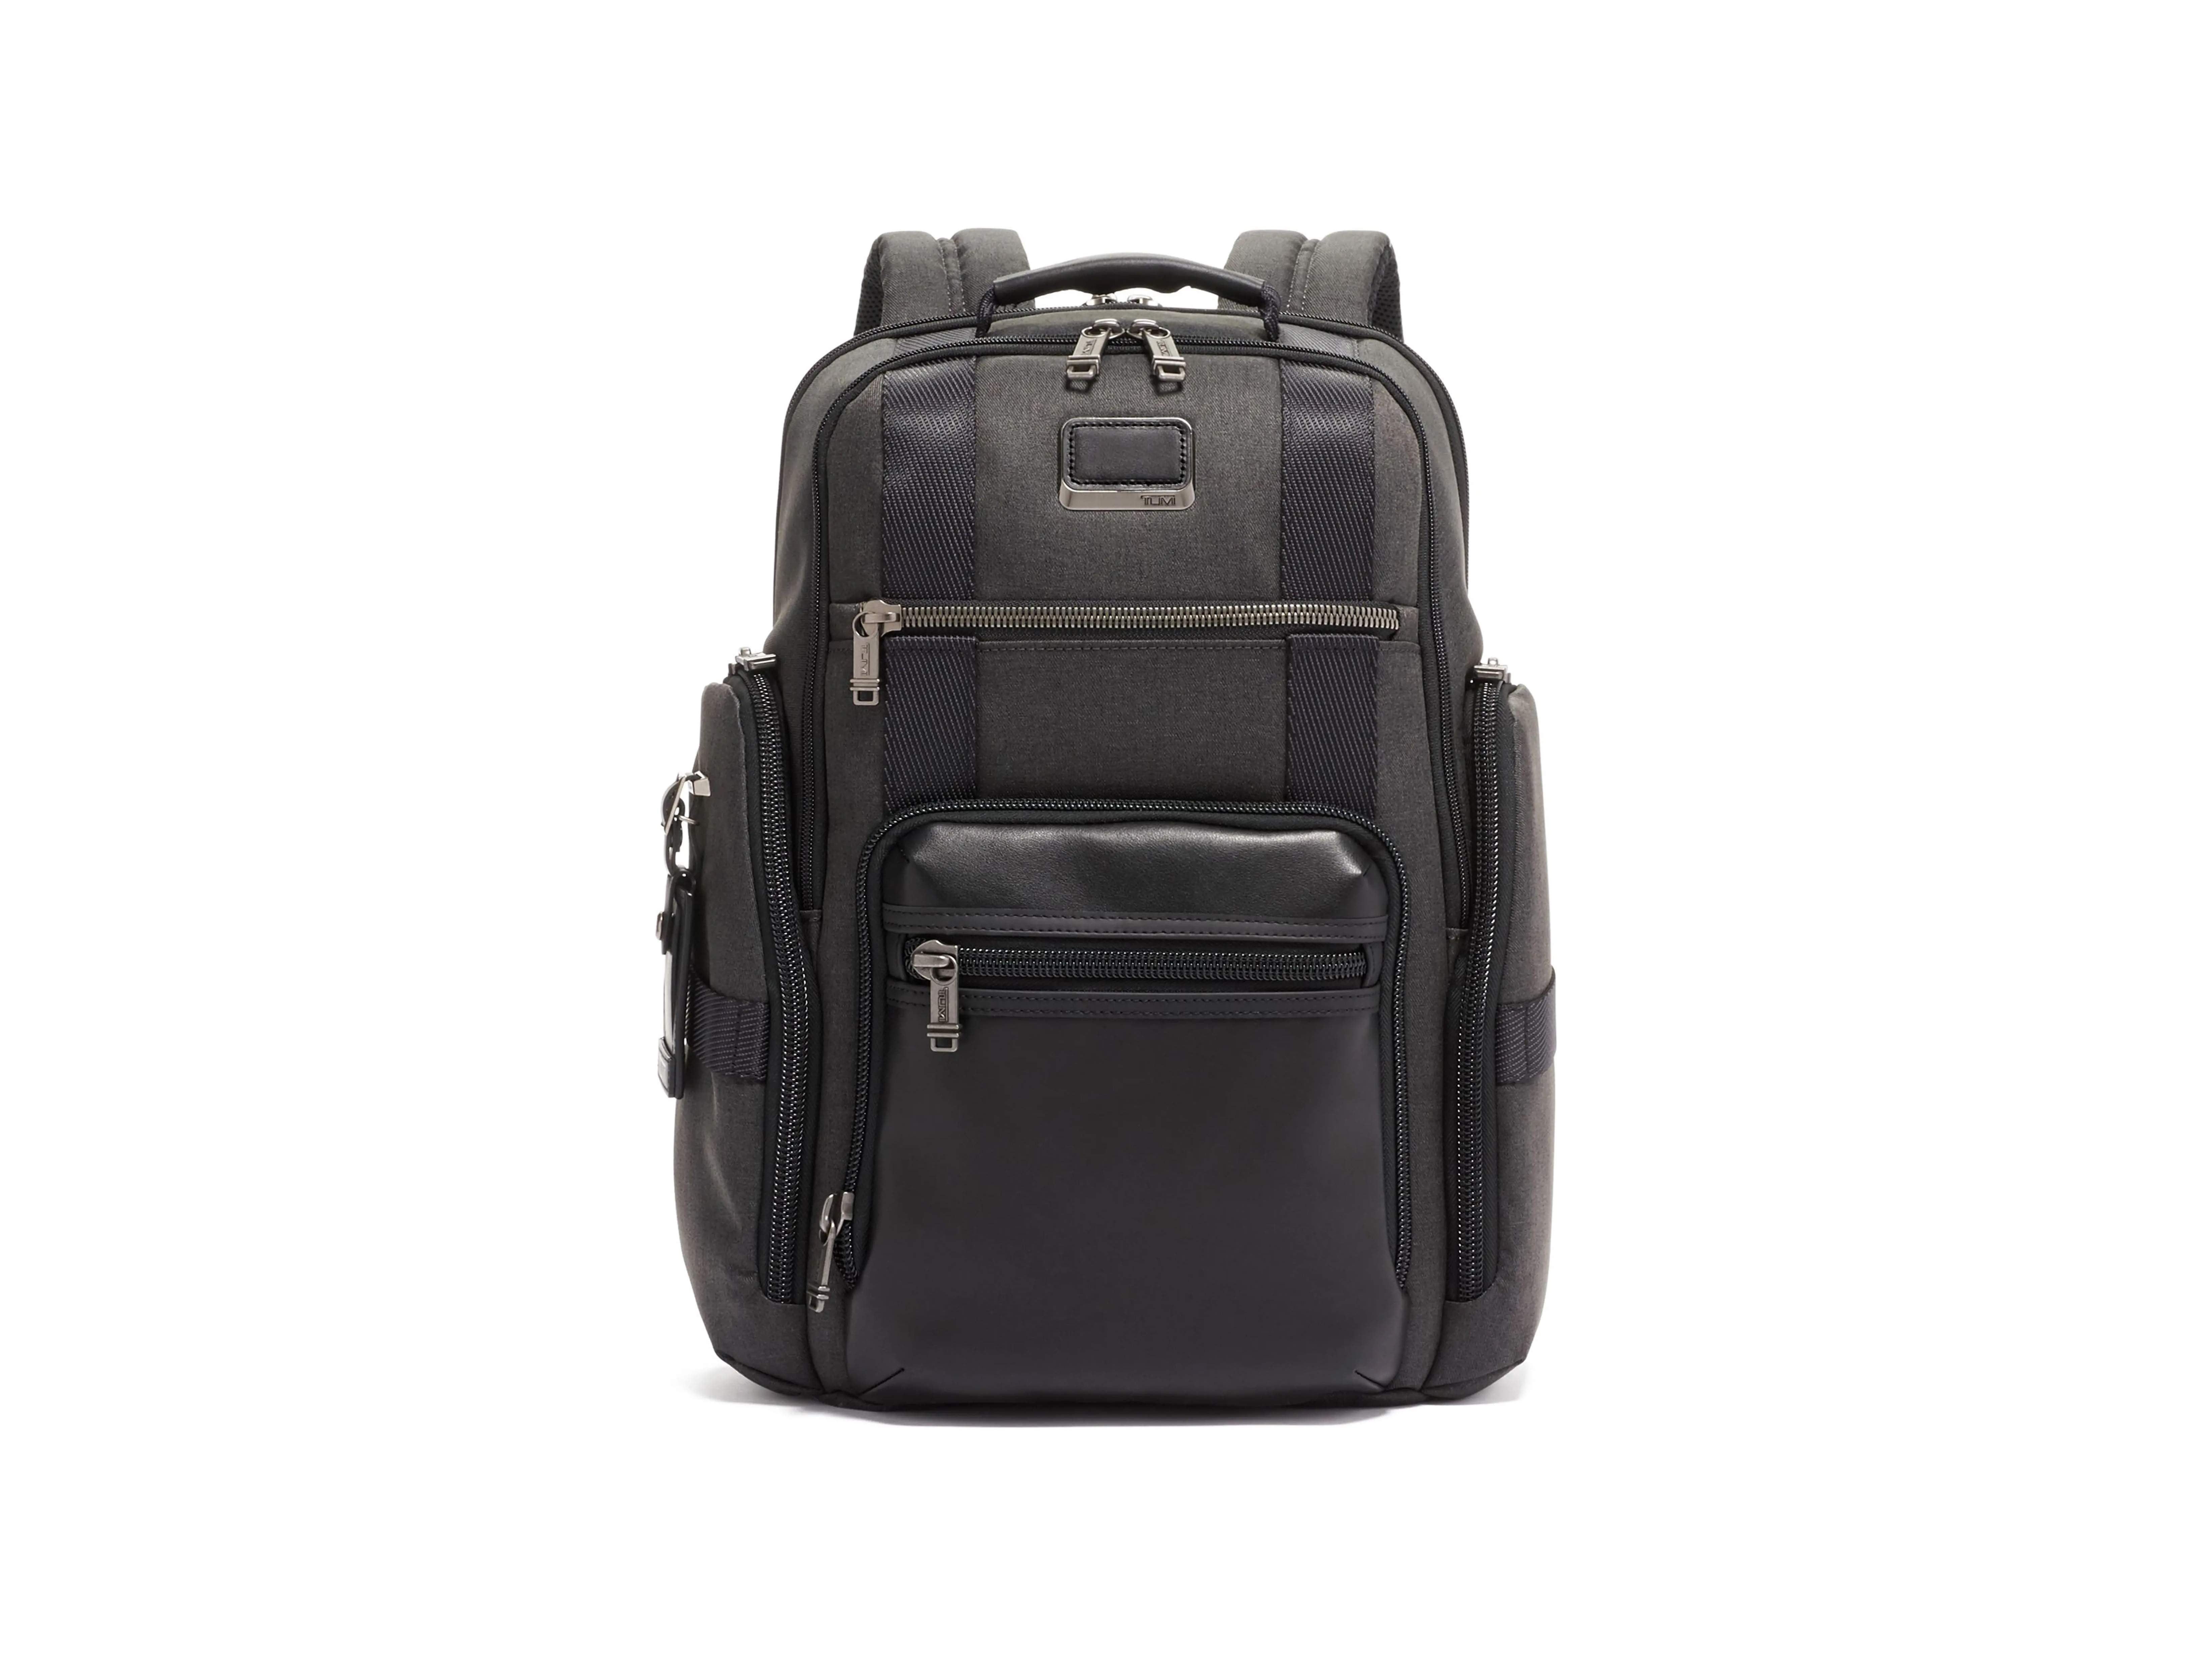 Best Leather Backpacks - Tumi